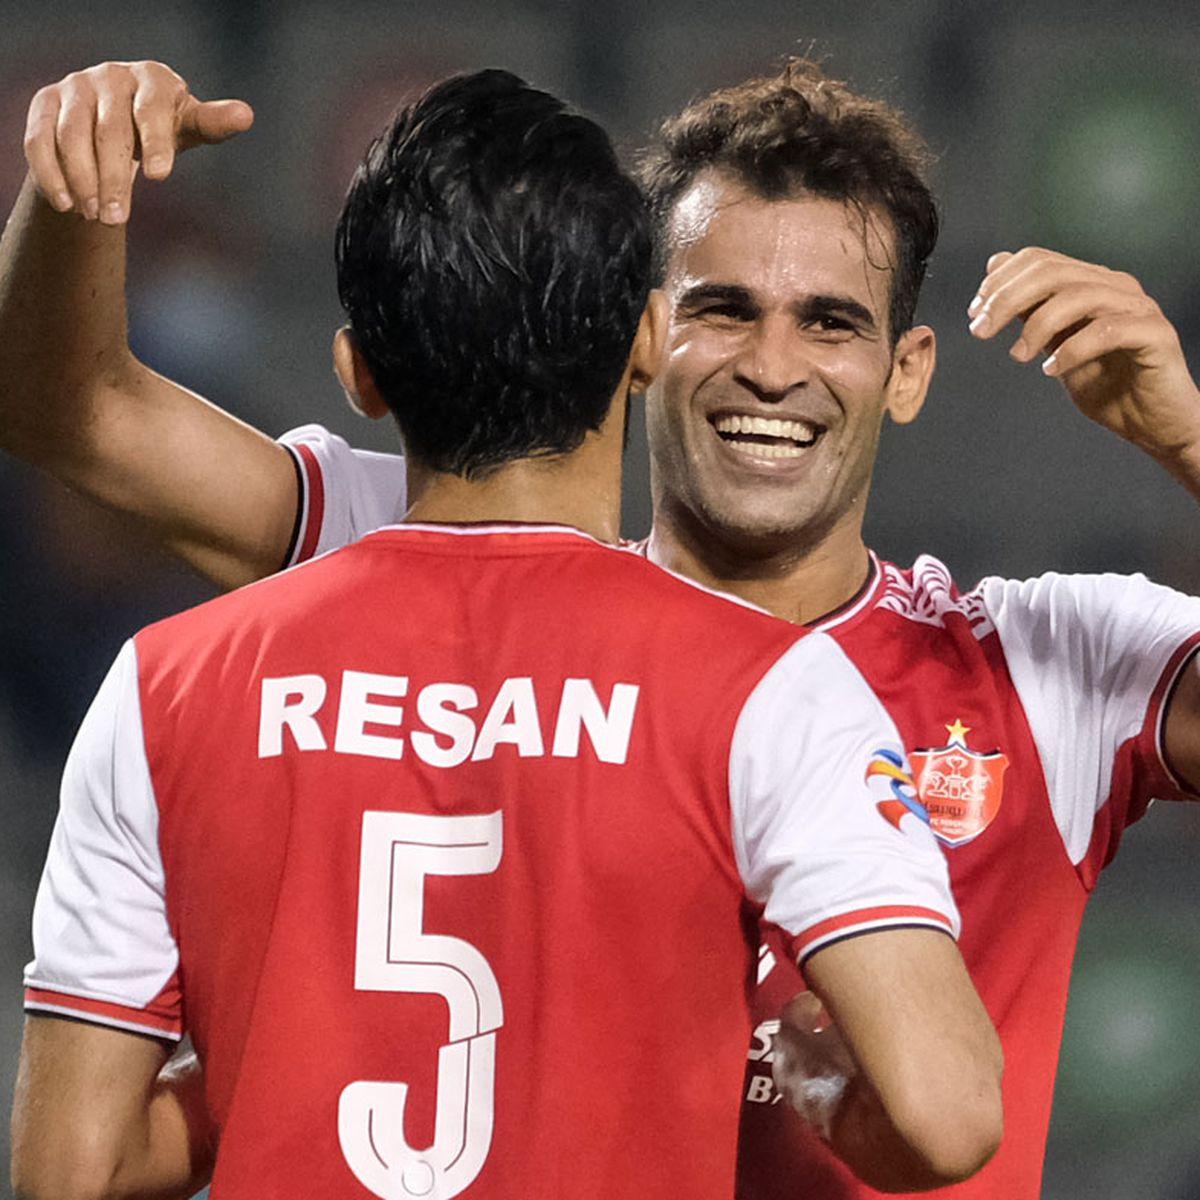 Iranian Footballer Issa Alekasir Banned For Goal Celebration